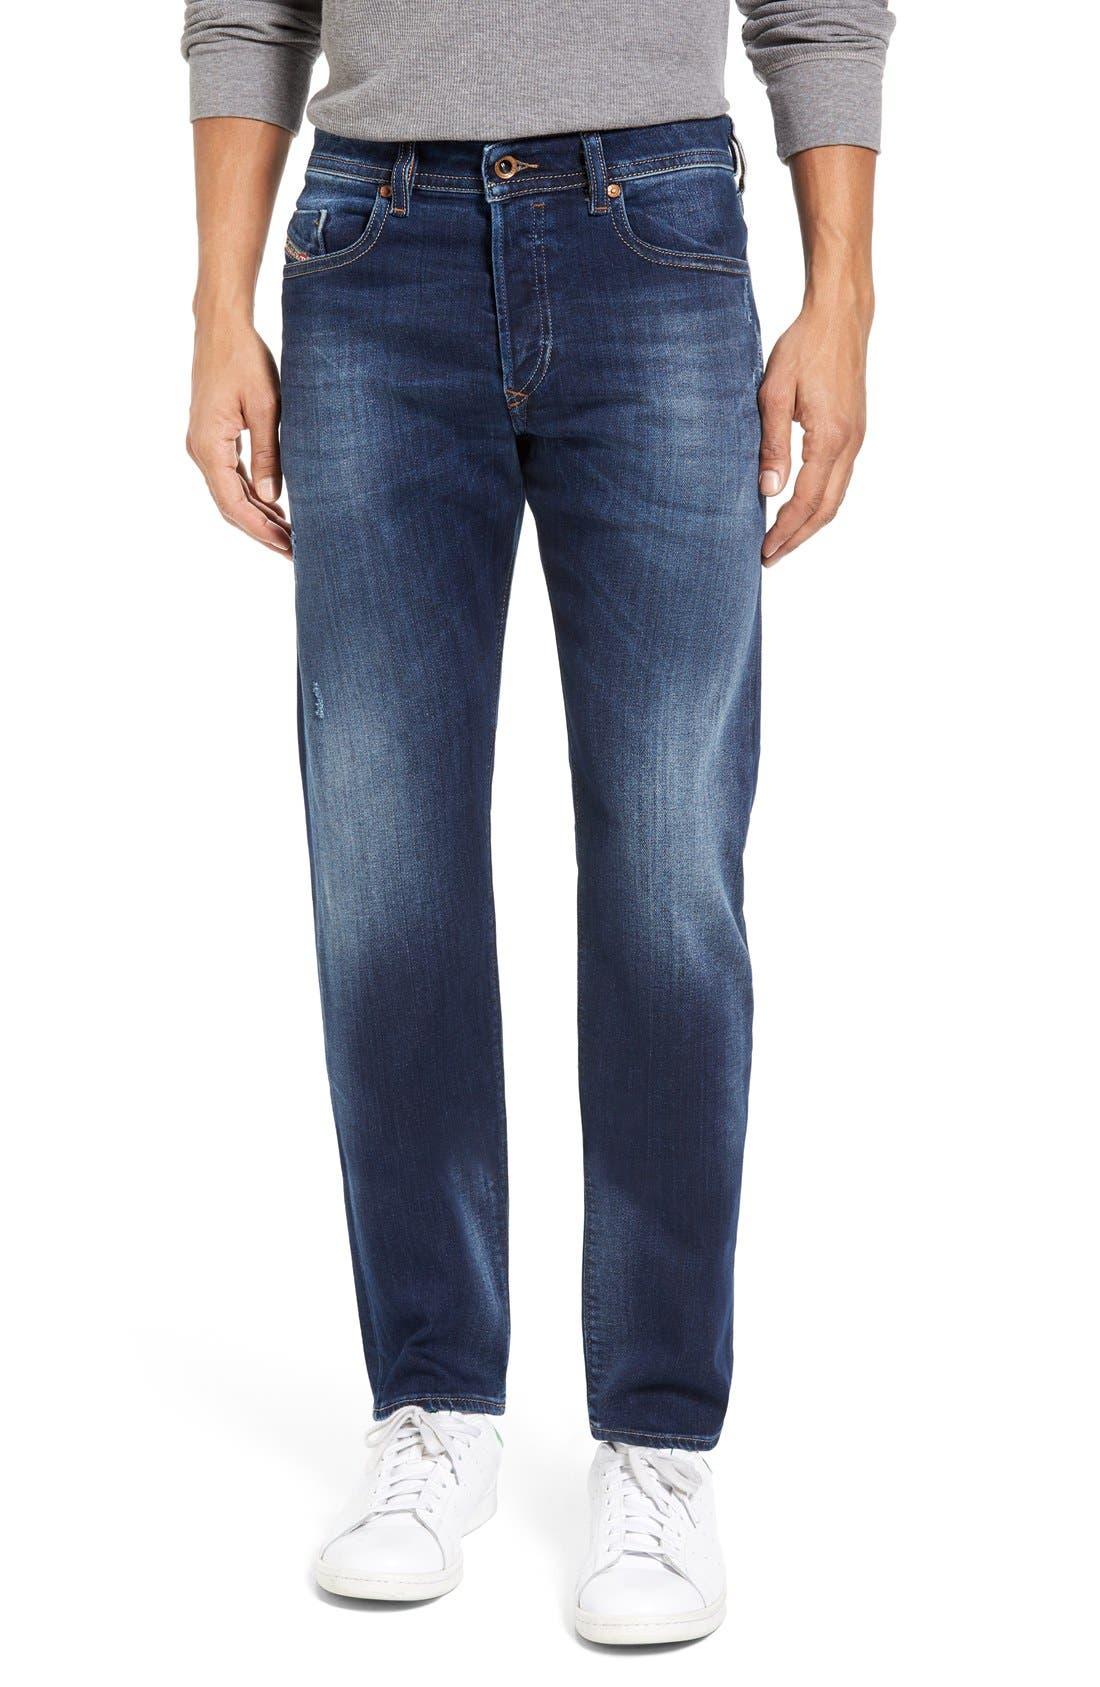 Alternate Image 1 Selected - DIESEL® Buster Slim Straight Leg Jeans (860L)